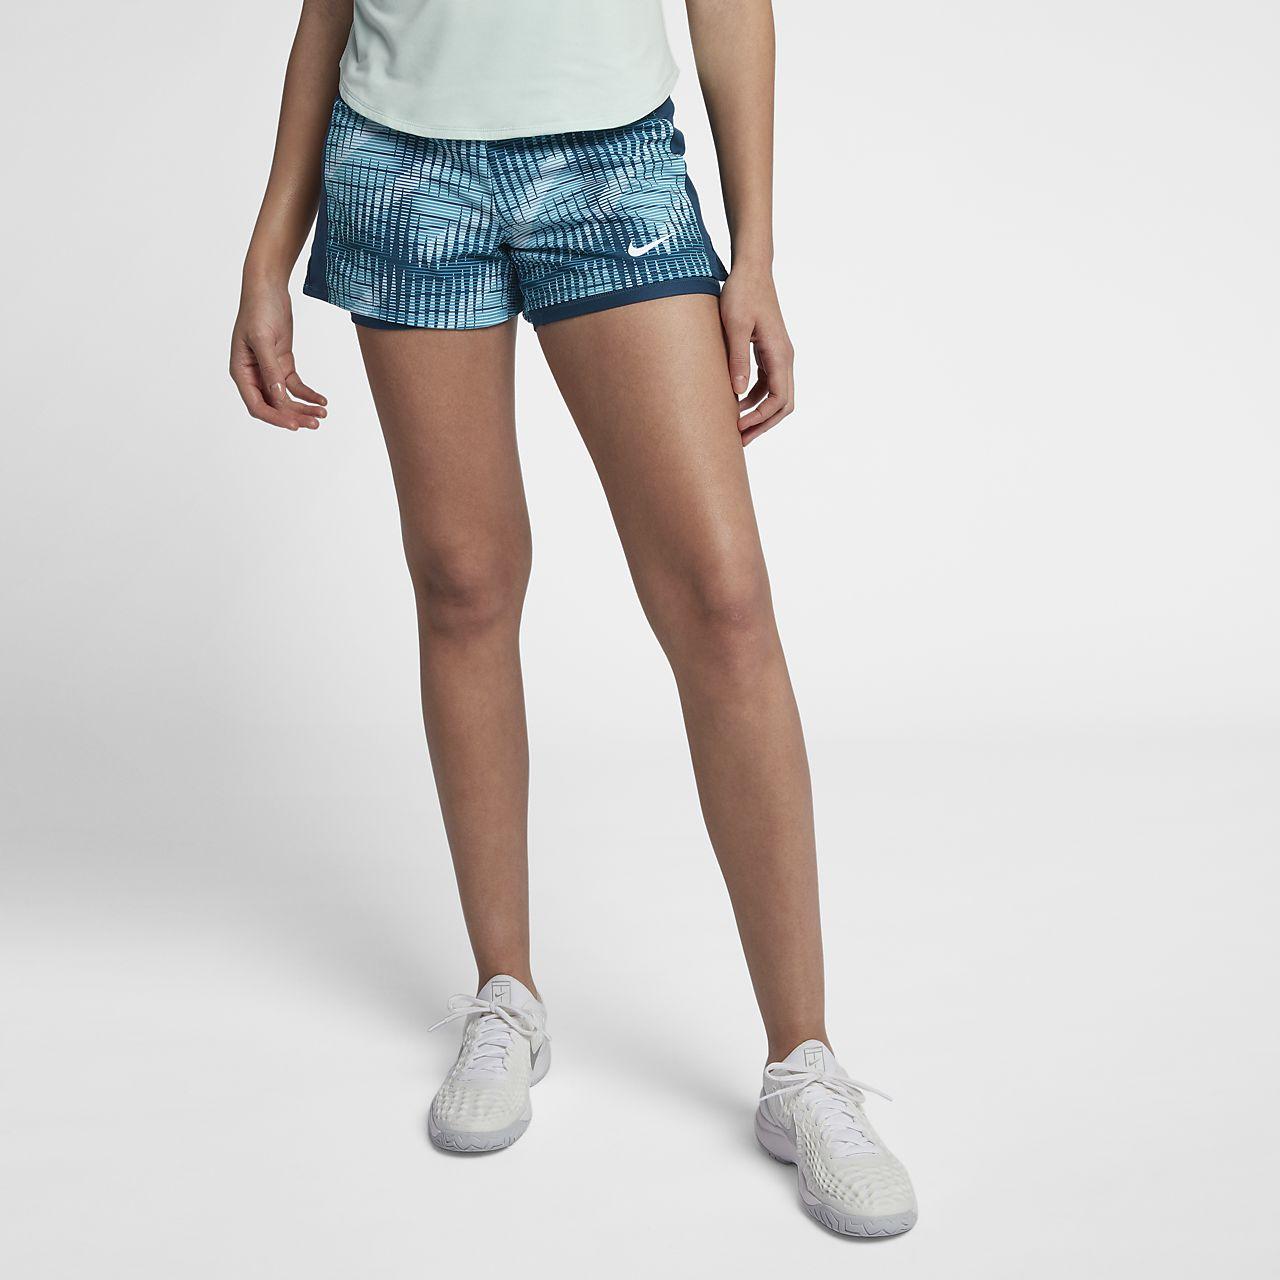 037380598a926 NikeCourt Flex Pure Women s Tennis Shorts. Nike.com CZ